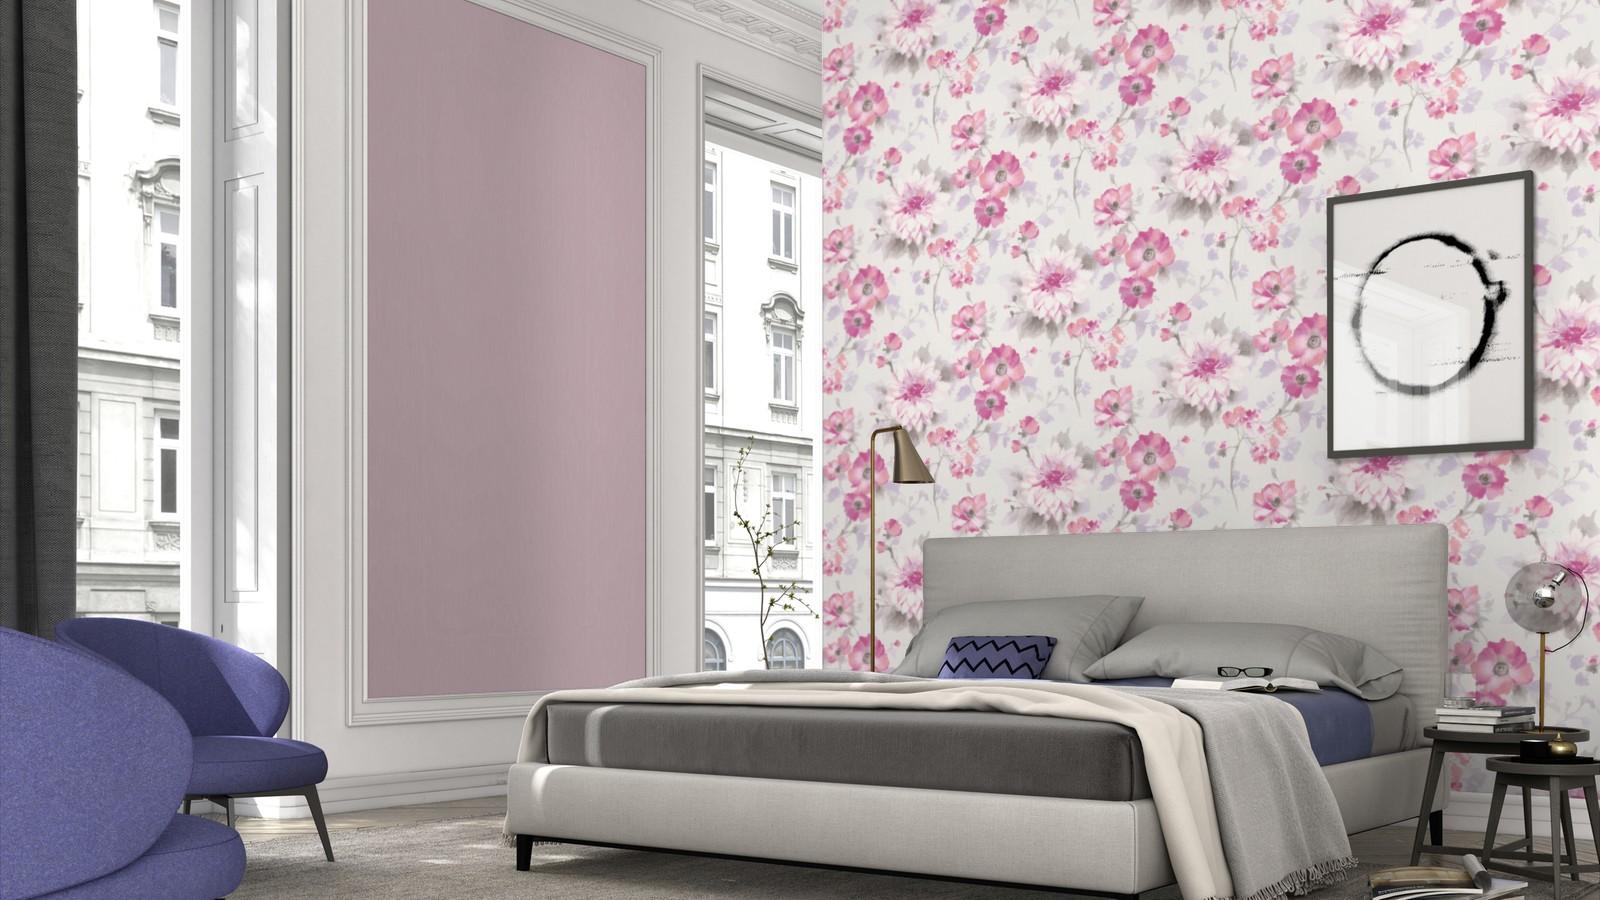 Обои Erismann GMK Fashion for Walls New 10051-05 (Эрисман)